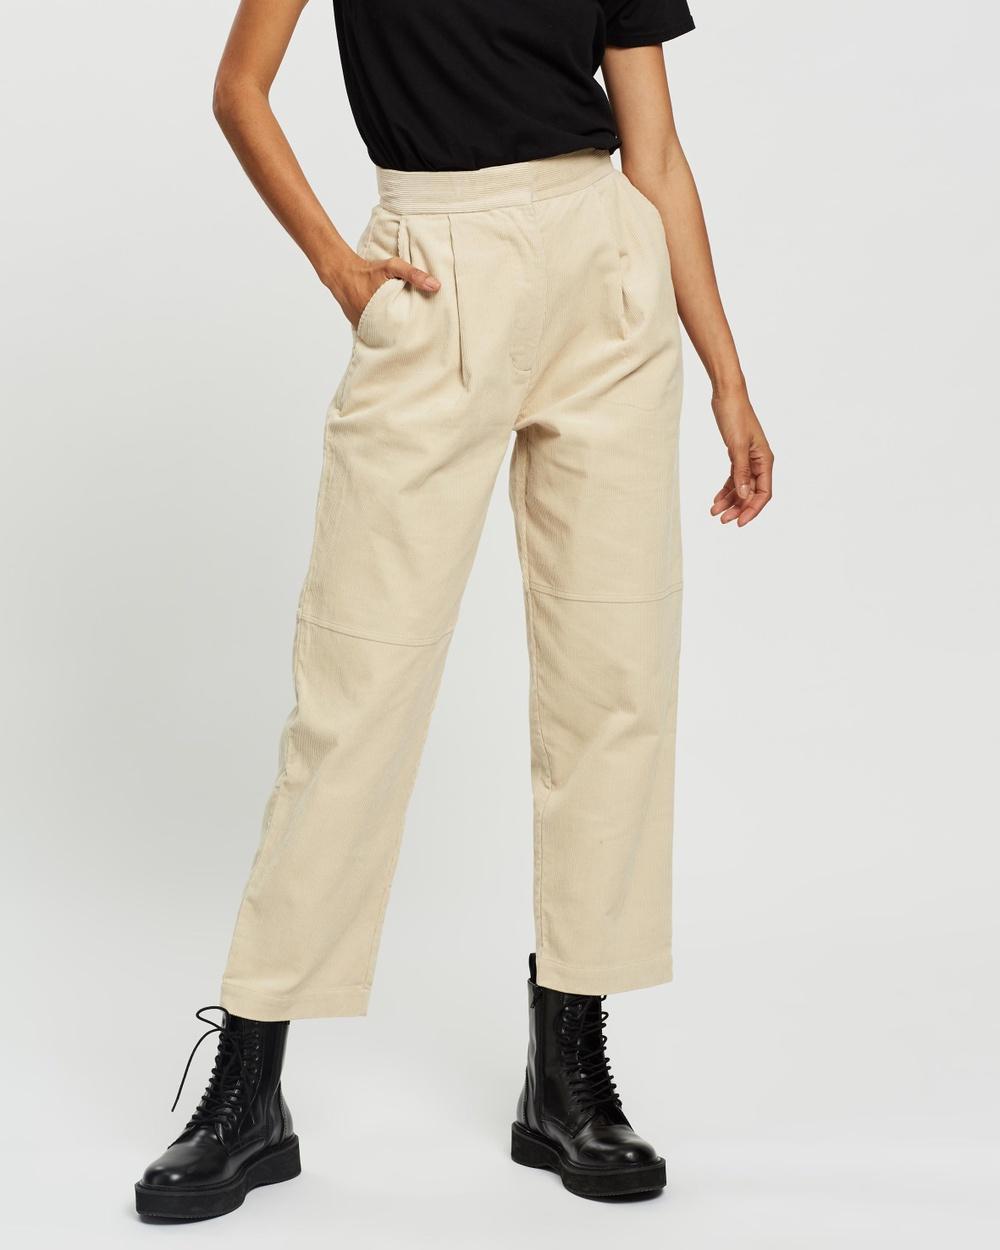 AERE Organic Cotton Cord Pants Neutral